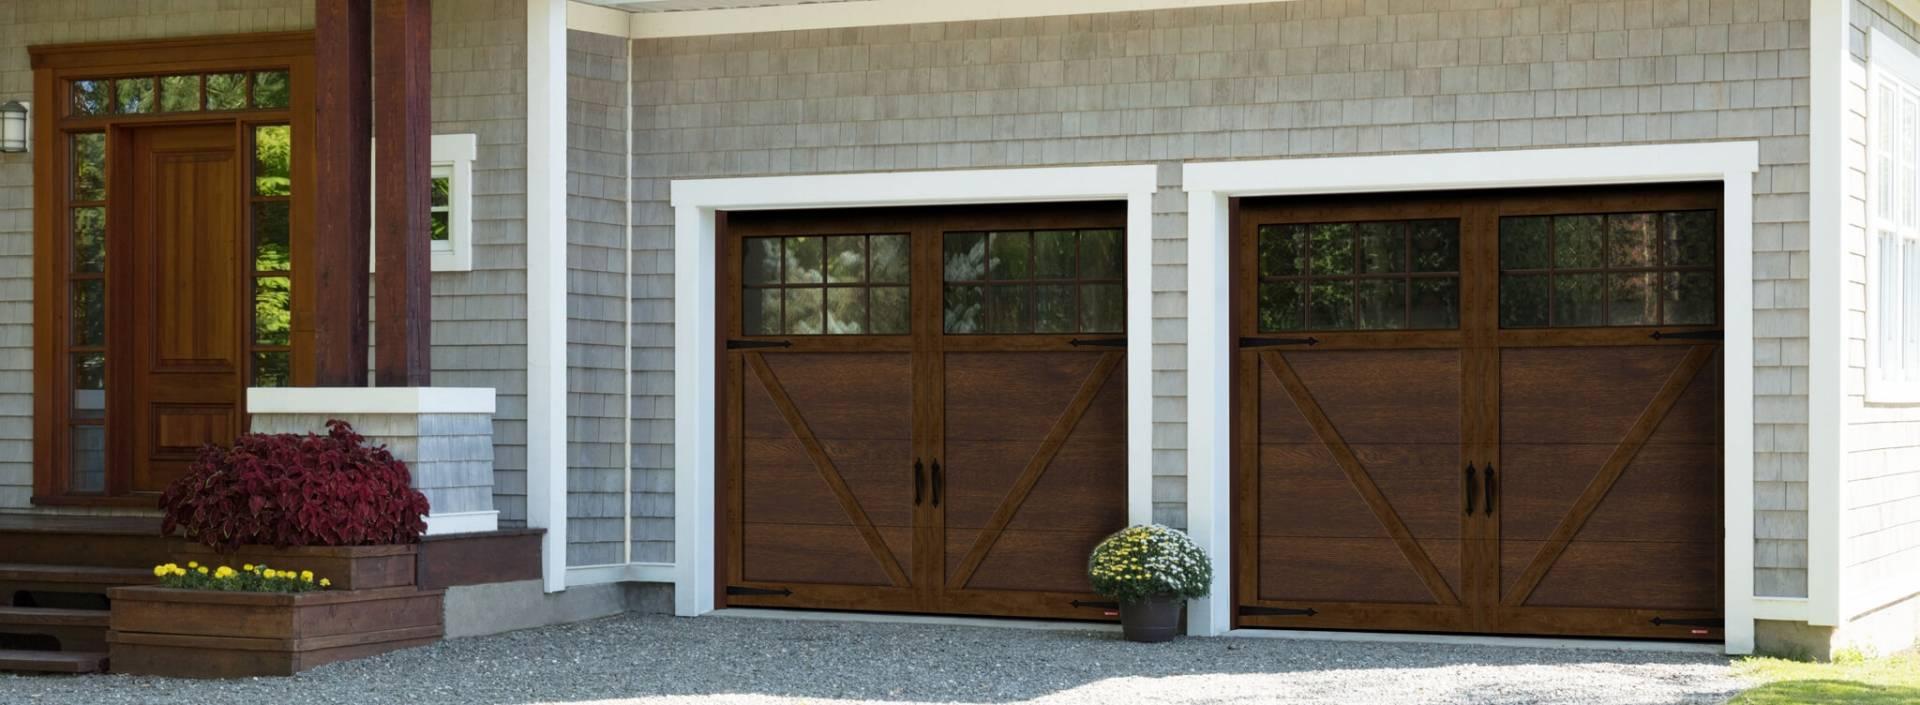 Princeton P 23, 8u0027 X 7u0027, Chocolate Walnut Door And Overlays